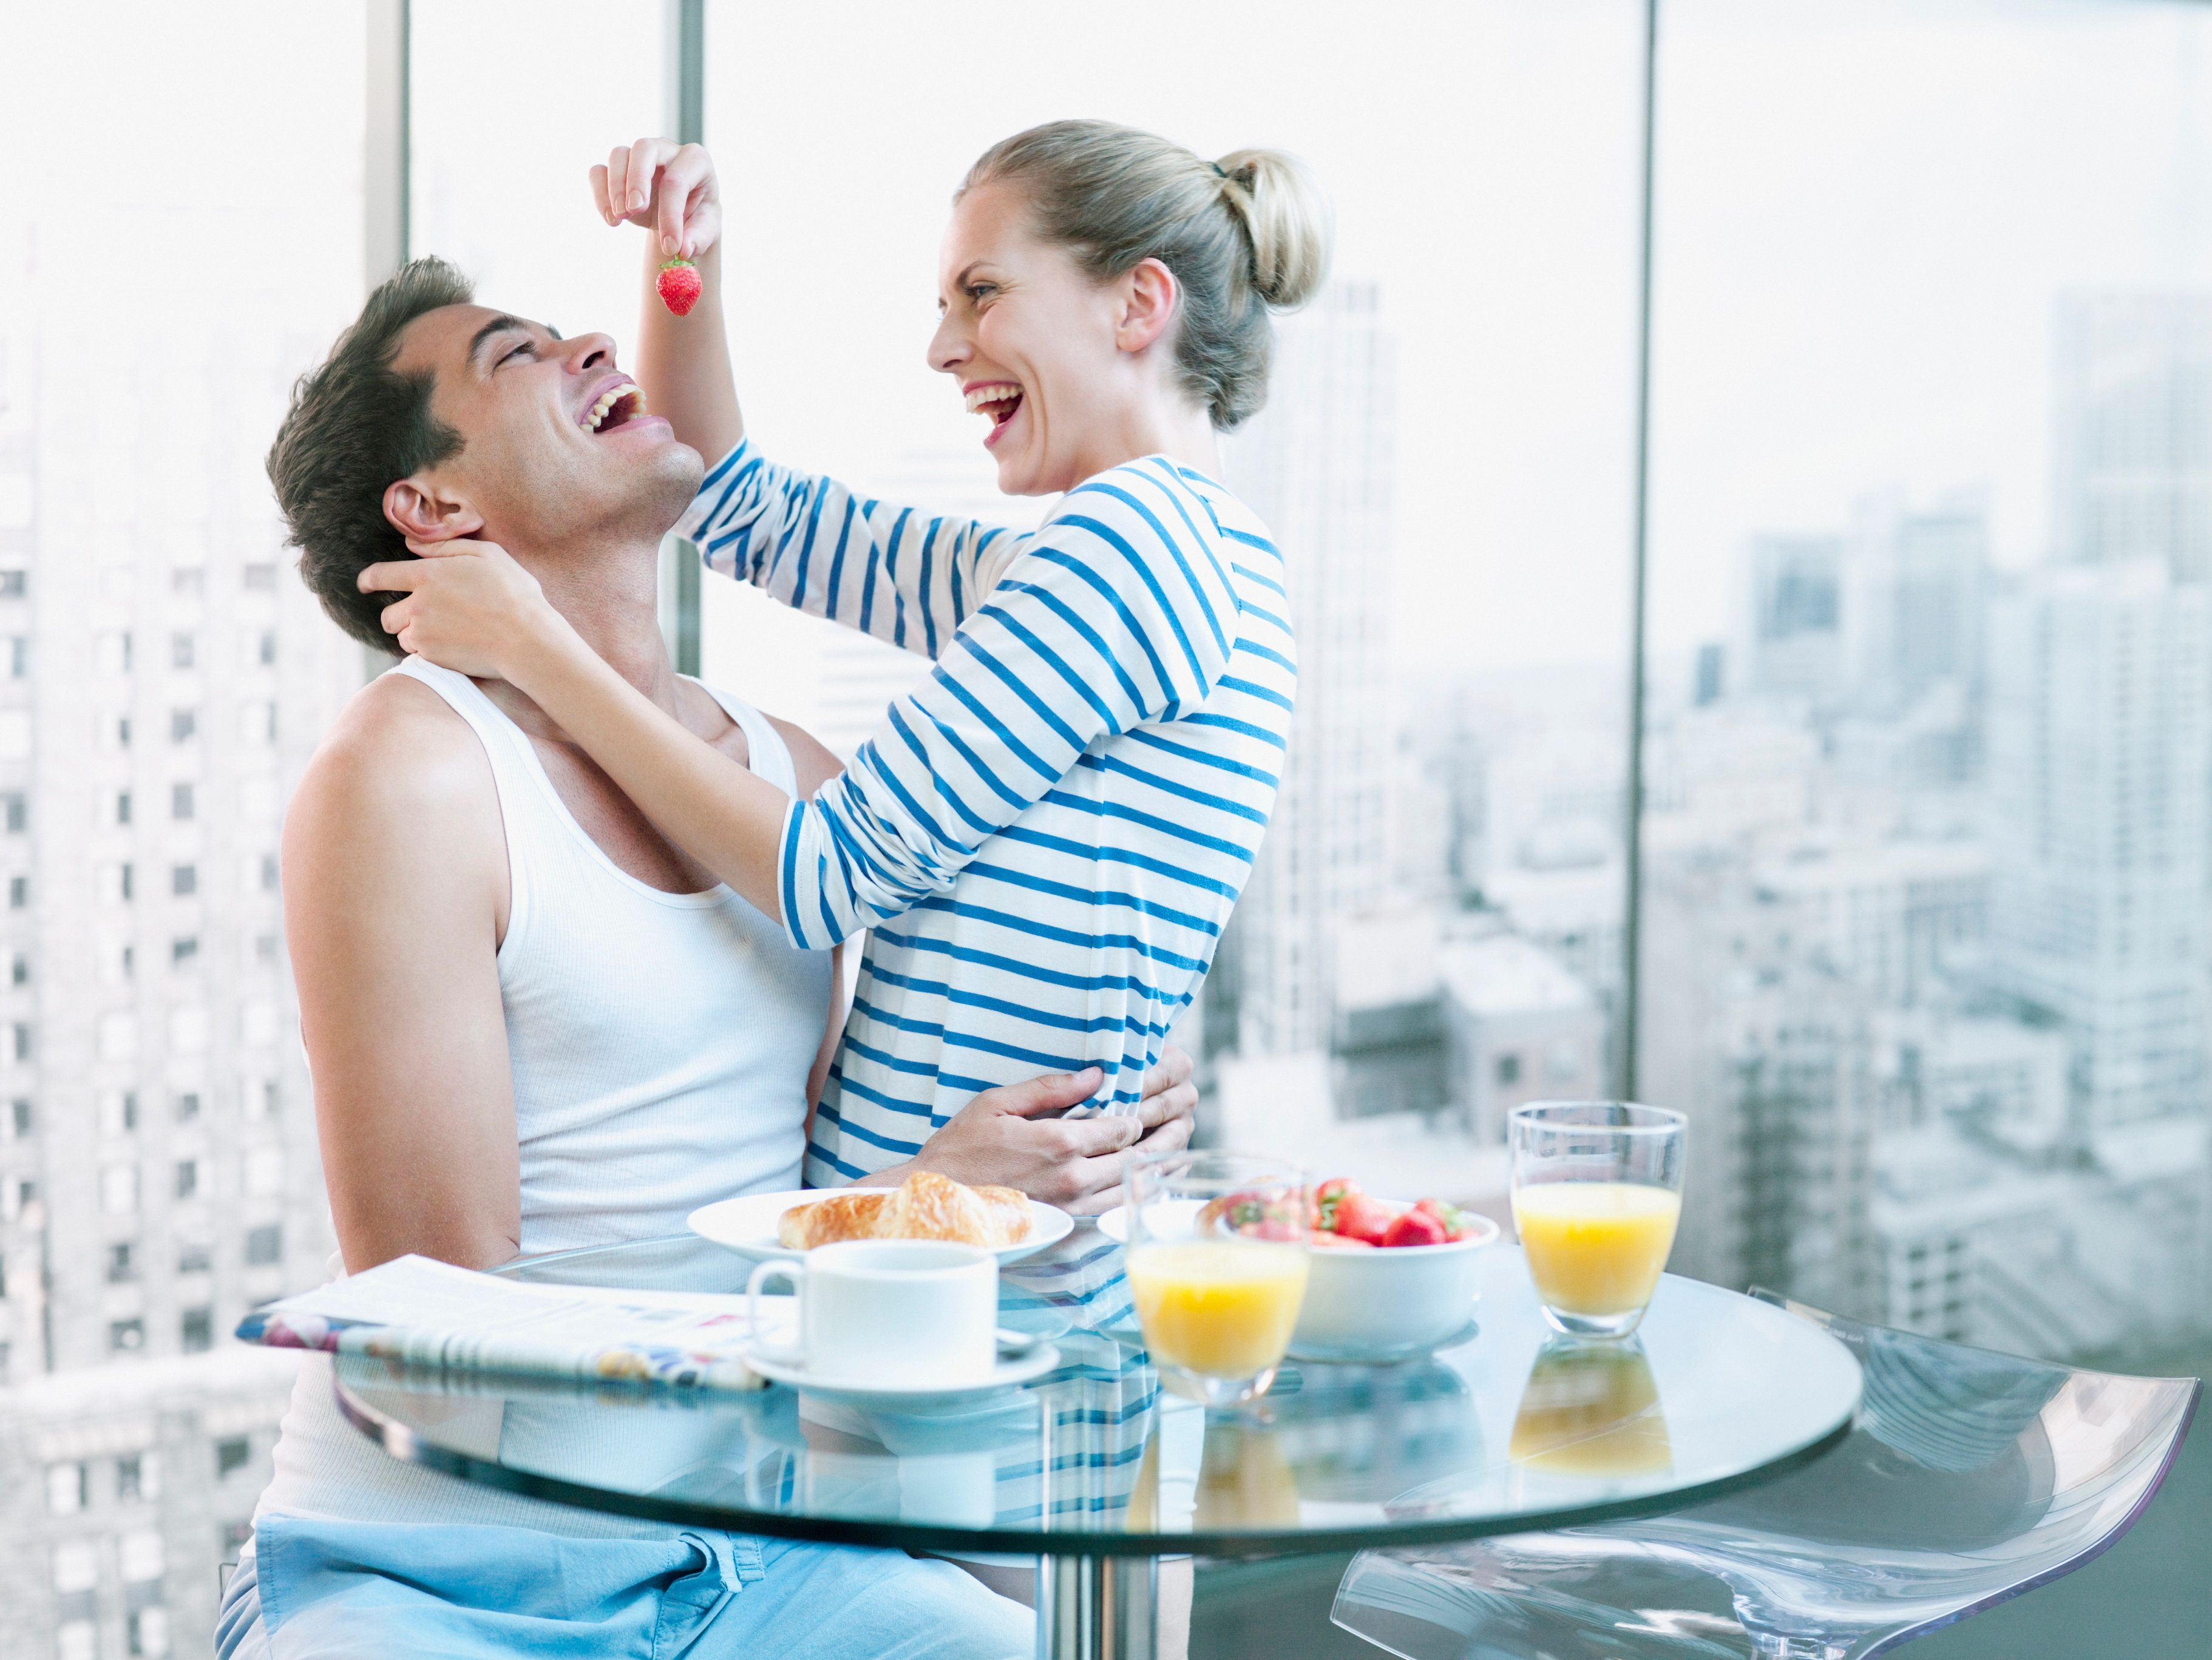 Playful woman feeding strawberry to husband at breakfast